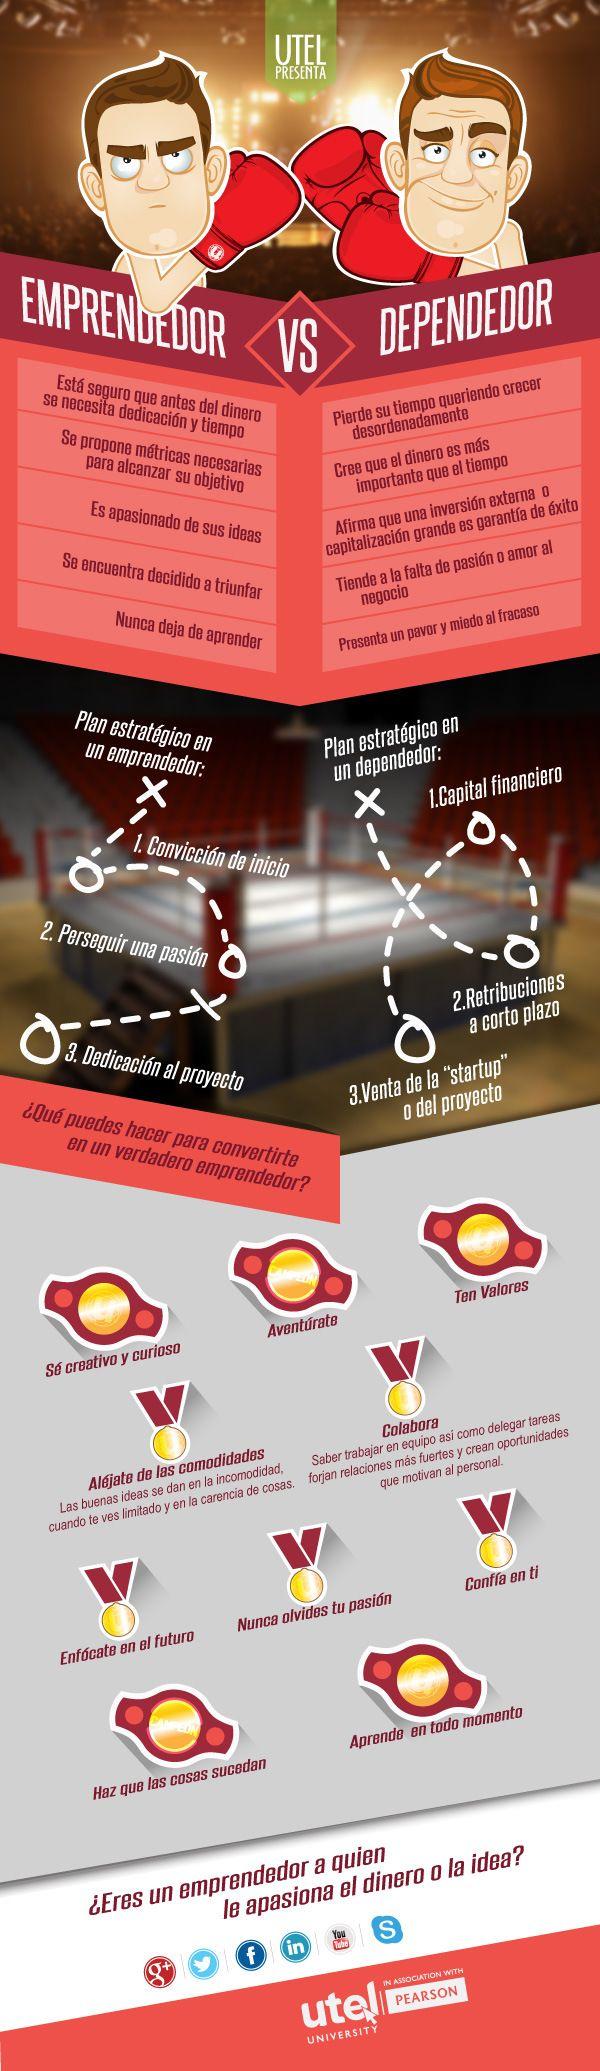 Emprendedor vs. dependedor #infografia #infographic #entrepreneurship